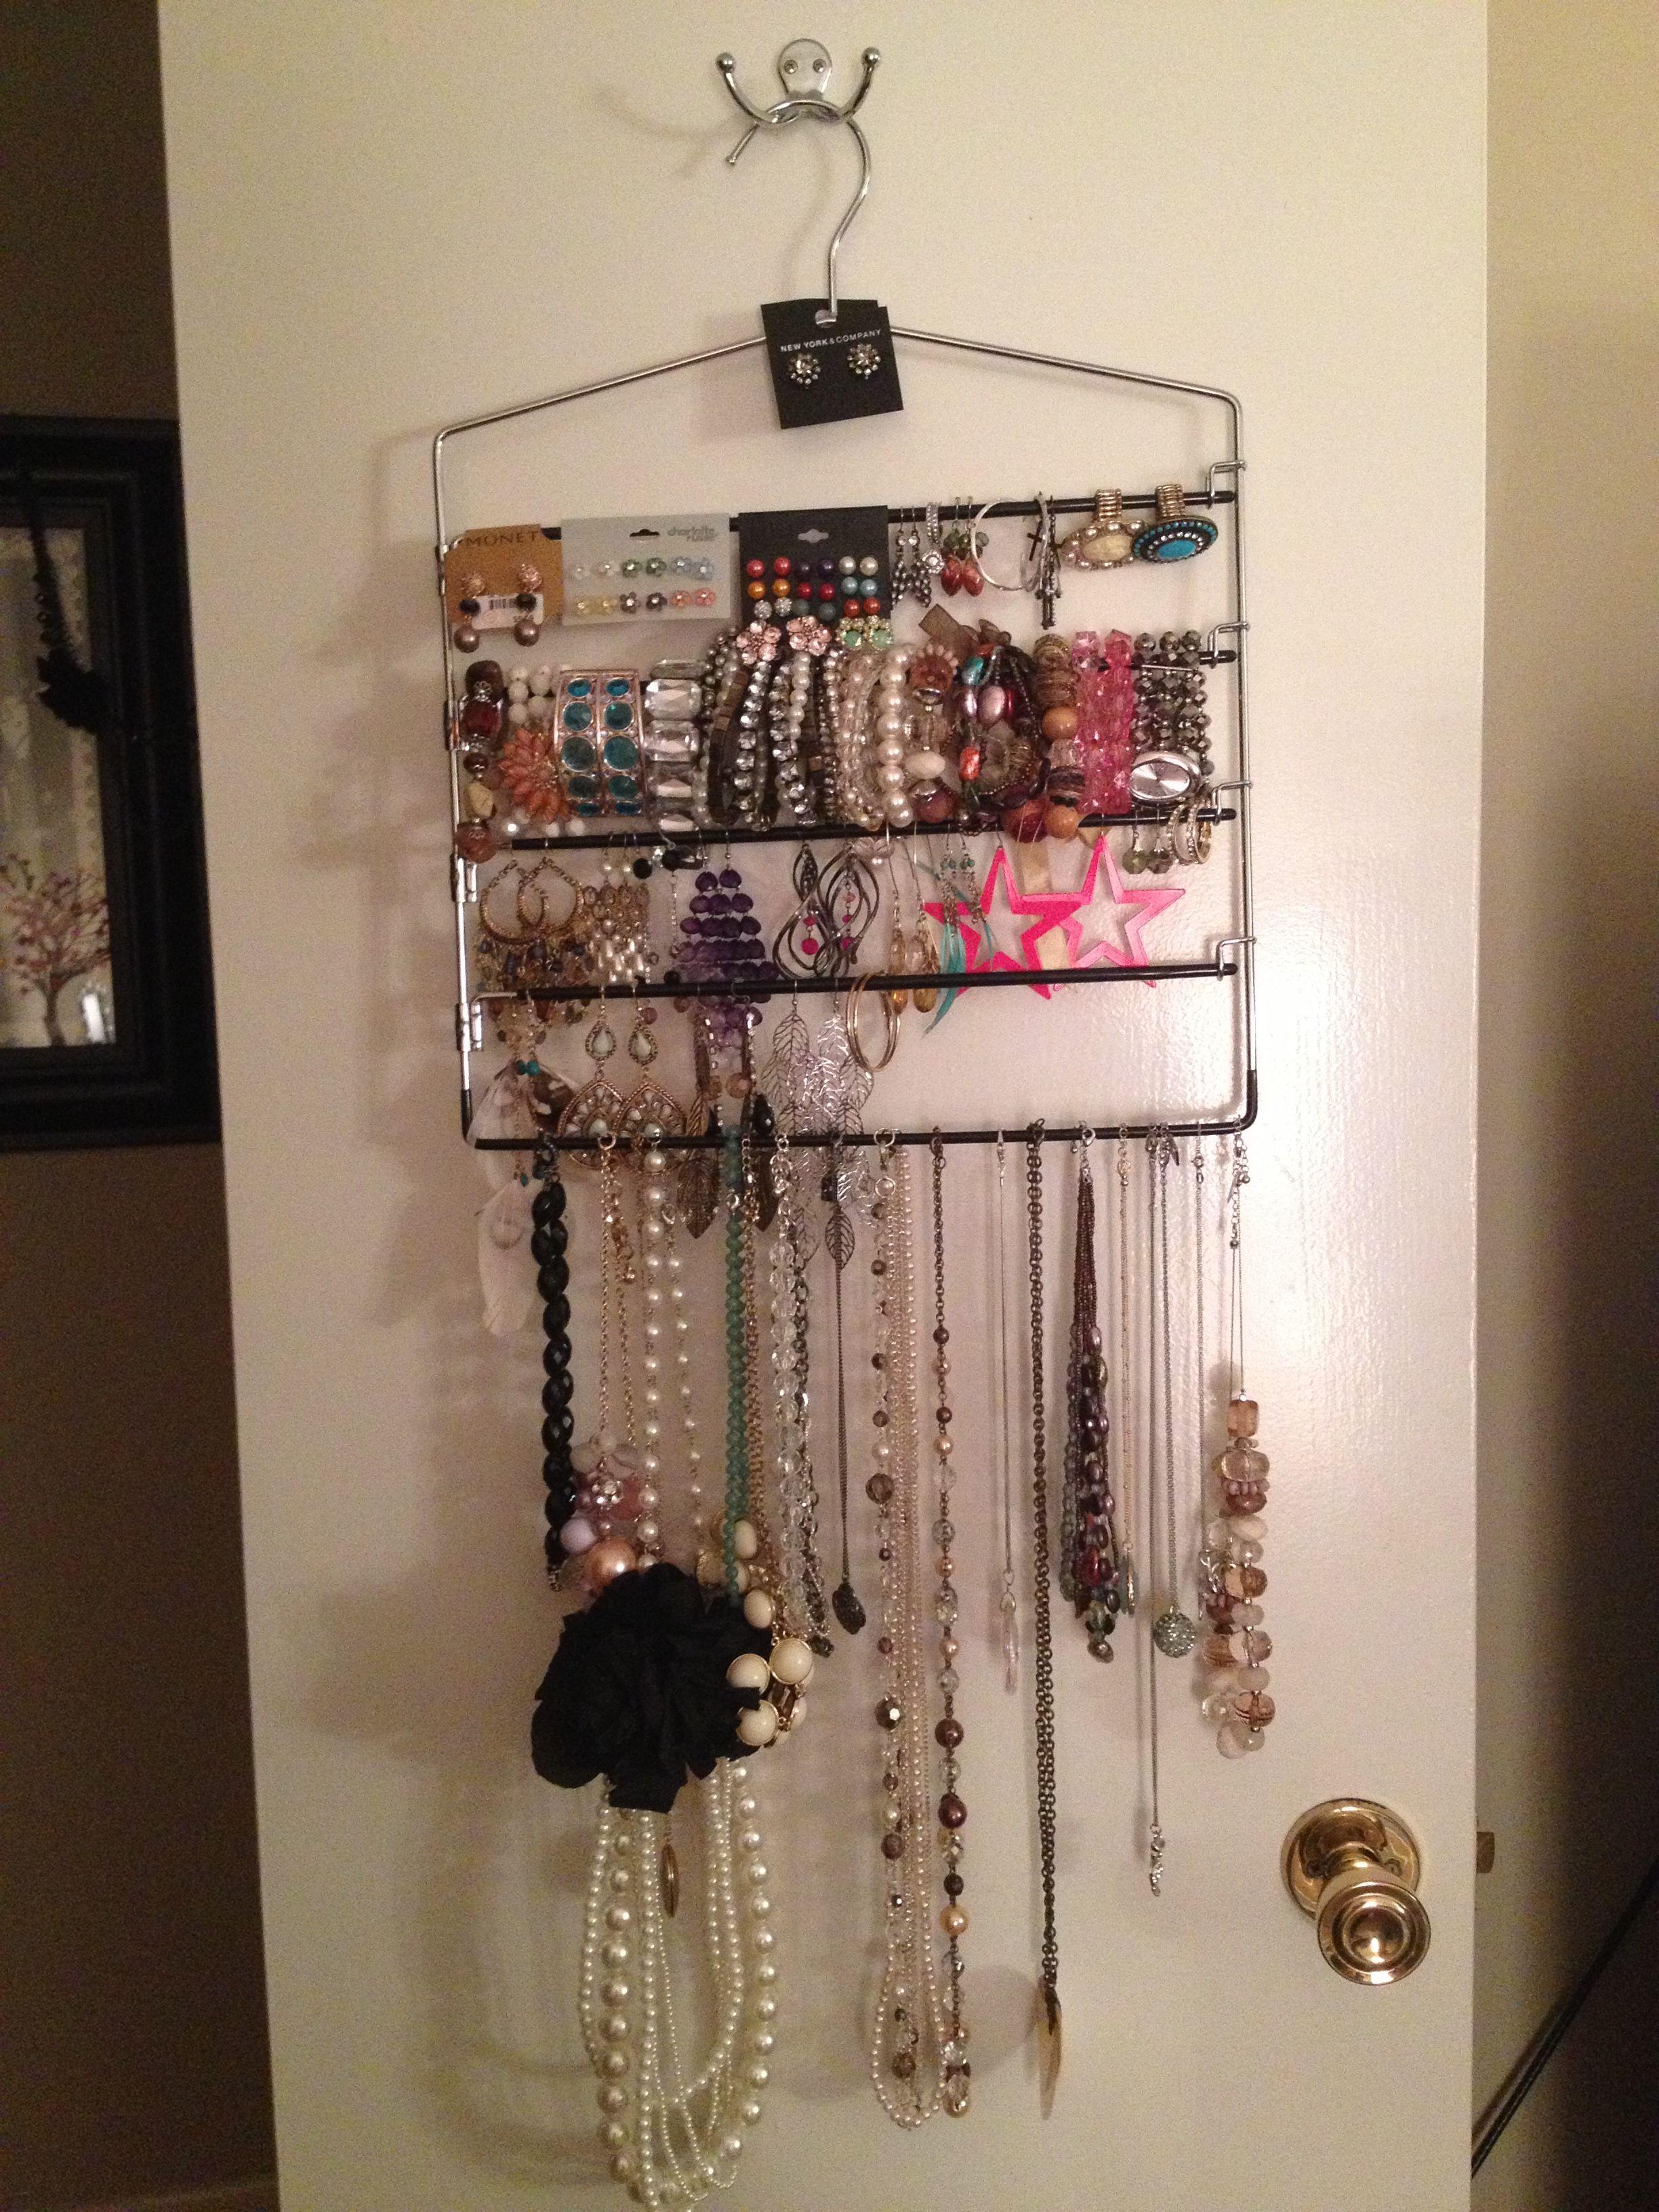 Dollar Store Slack Rack Now A Jewelry Organizer Jewelry Organization Organization